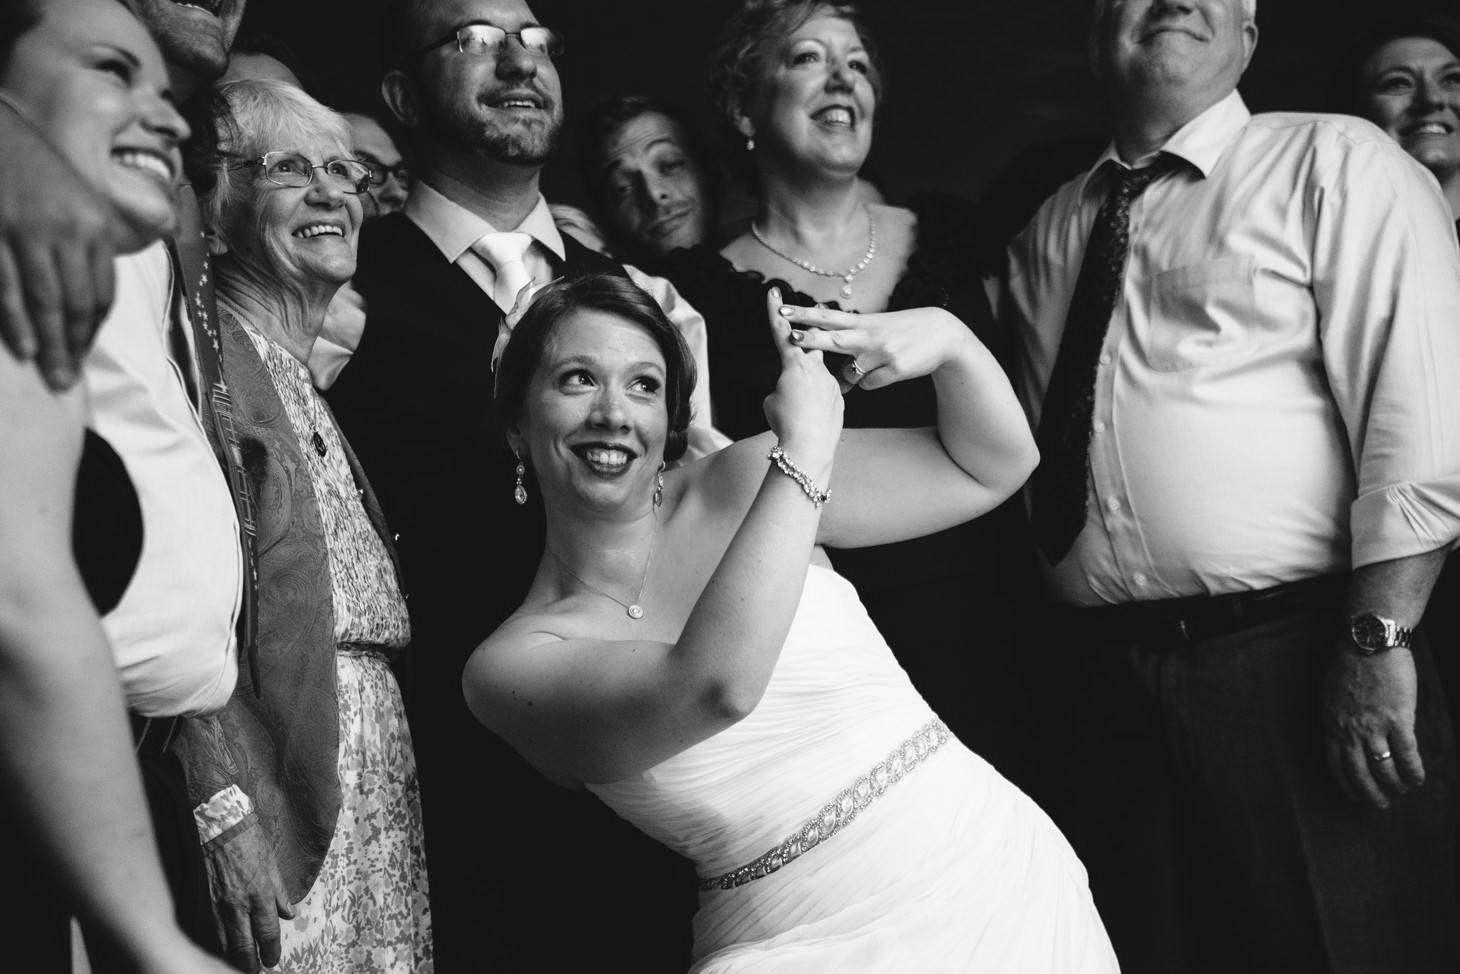 052-nyc-wedding-photographer-nj-nerdy-dr-who-firehouse-wedding-smitten-chickens.jpg